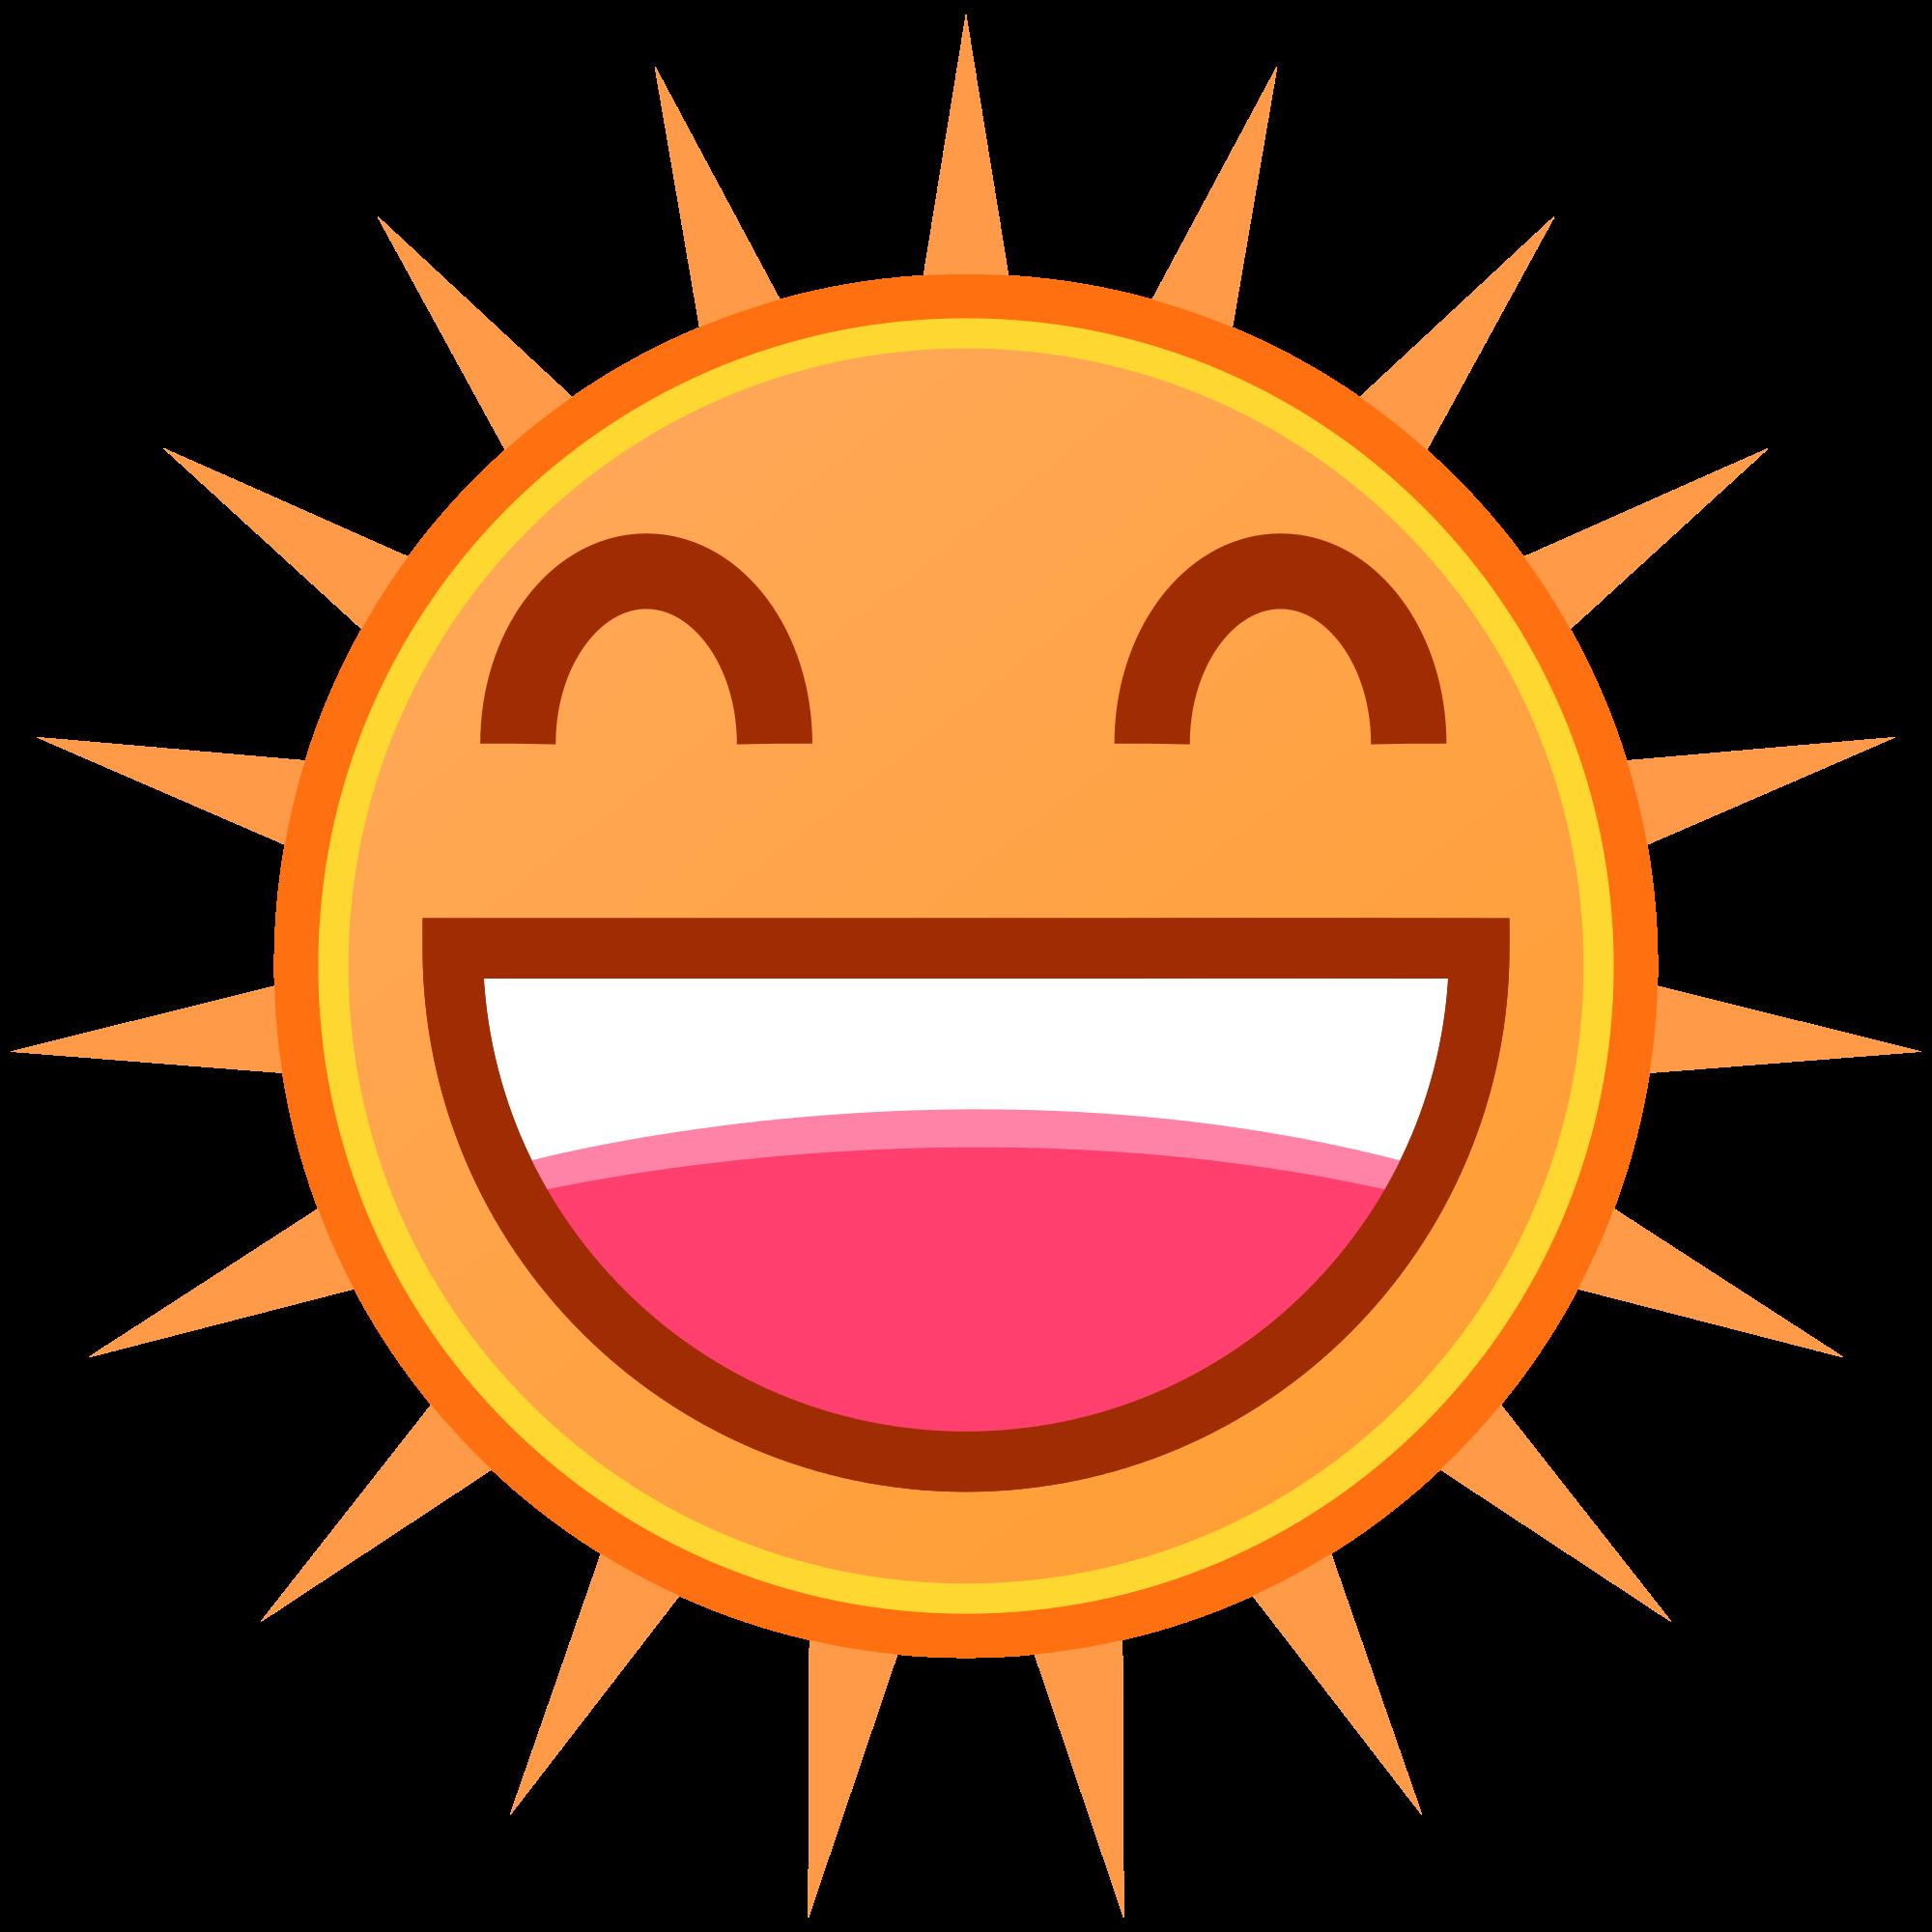 Retro sun clipart clip art freeuse  clip art freeuse